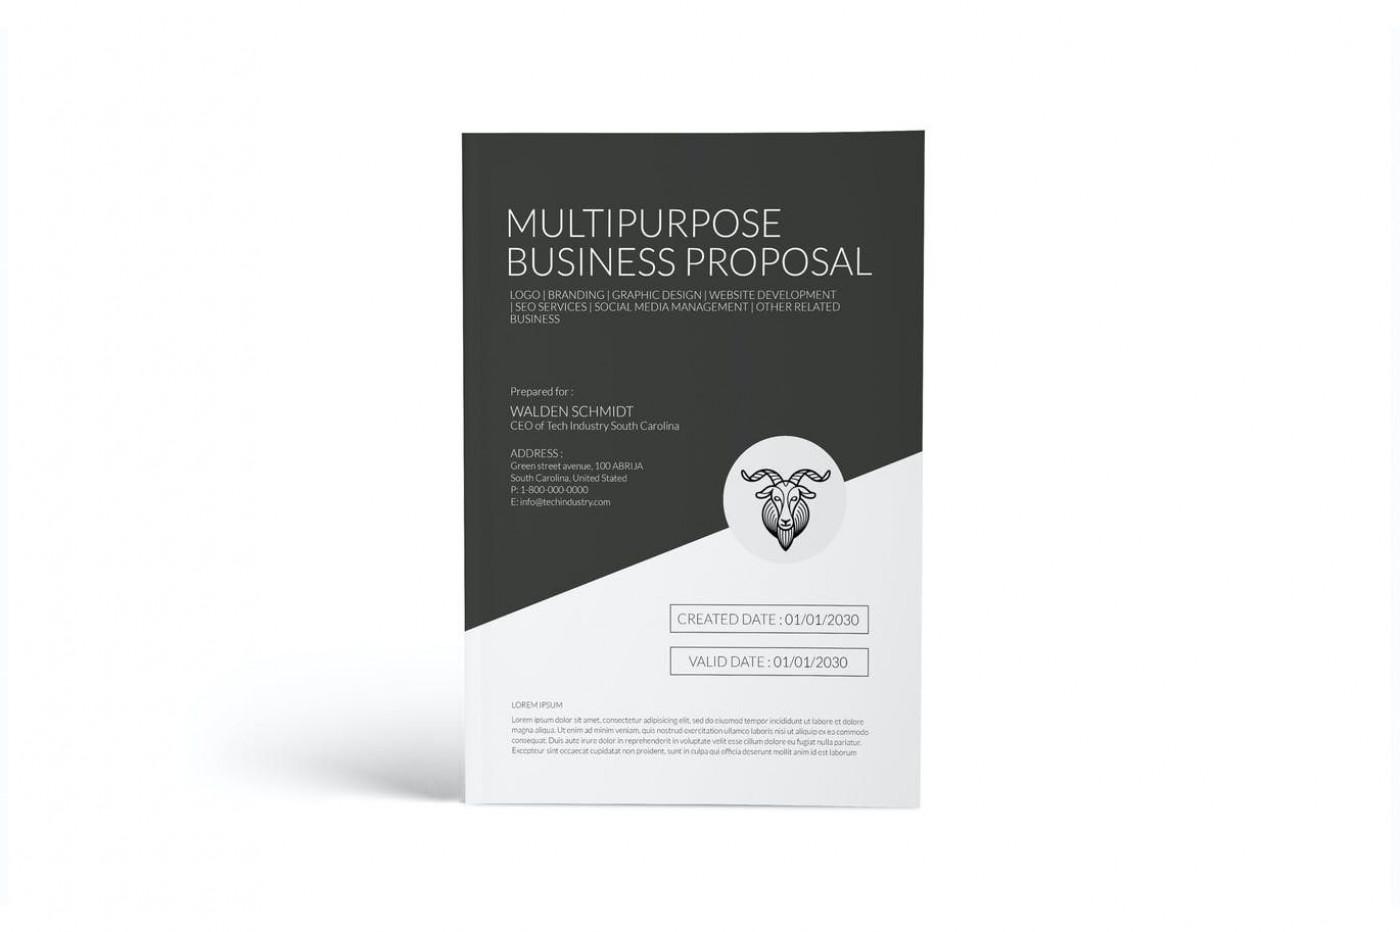 009 Imposing Web Development Proposal Template Pdf Highest Clarity  Sample1400